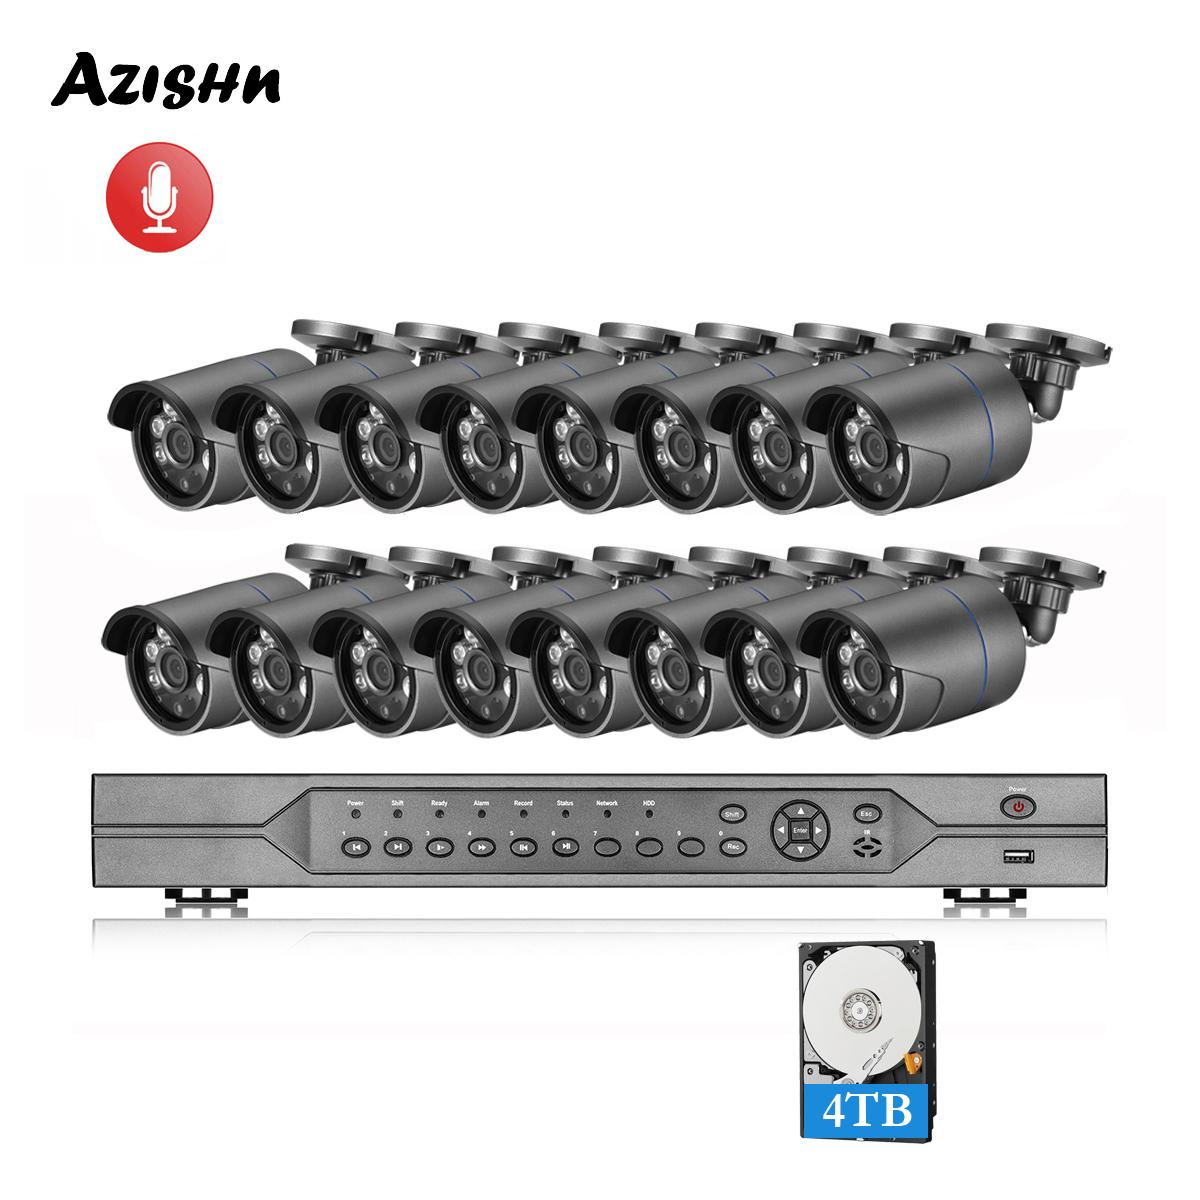 Azishn 16CH 5MP Poe NVR Kiti H.265 CCTV Güvenlik Sistemi Su Geçirmez 5MP 2592x1944 IP Kamera Yüz Algılama P2P Video Gözetleme Seti LJ201209